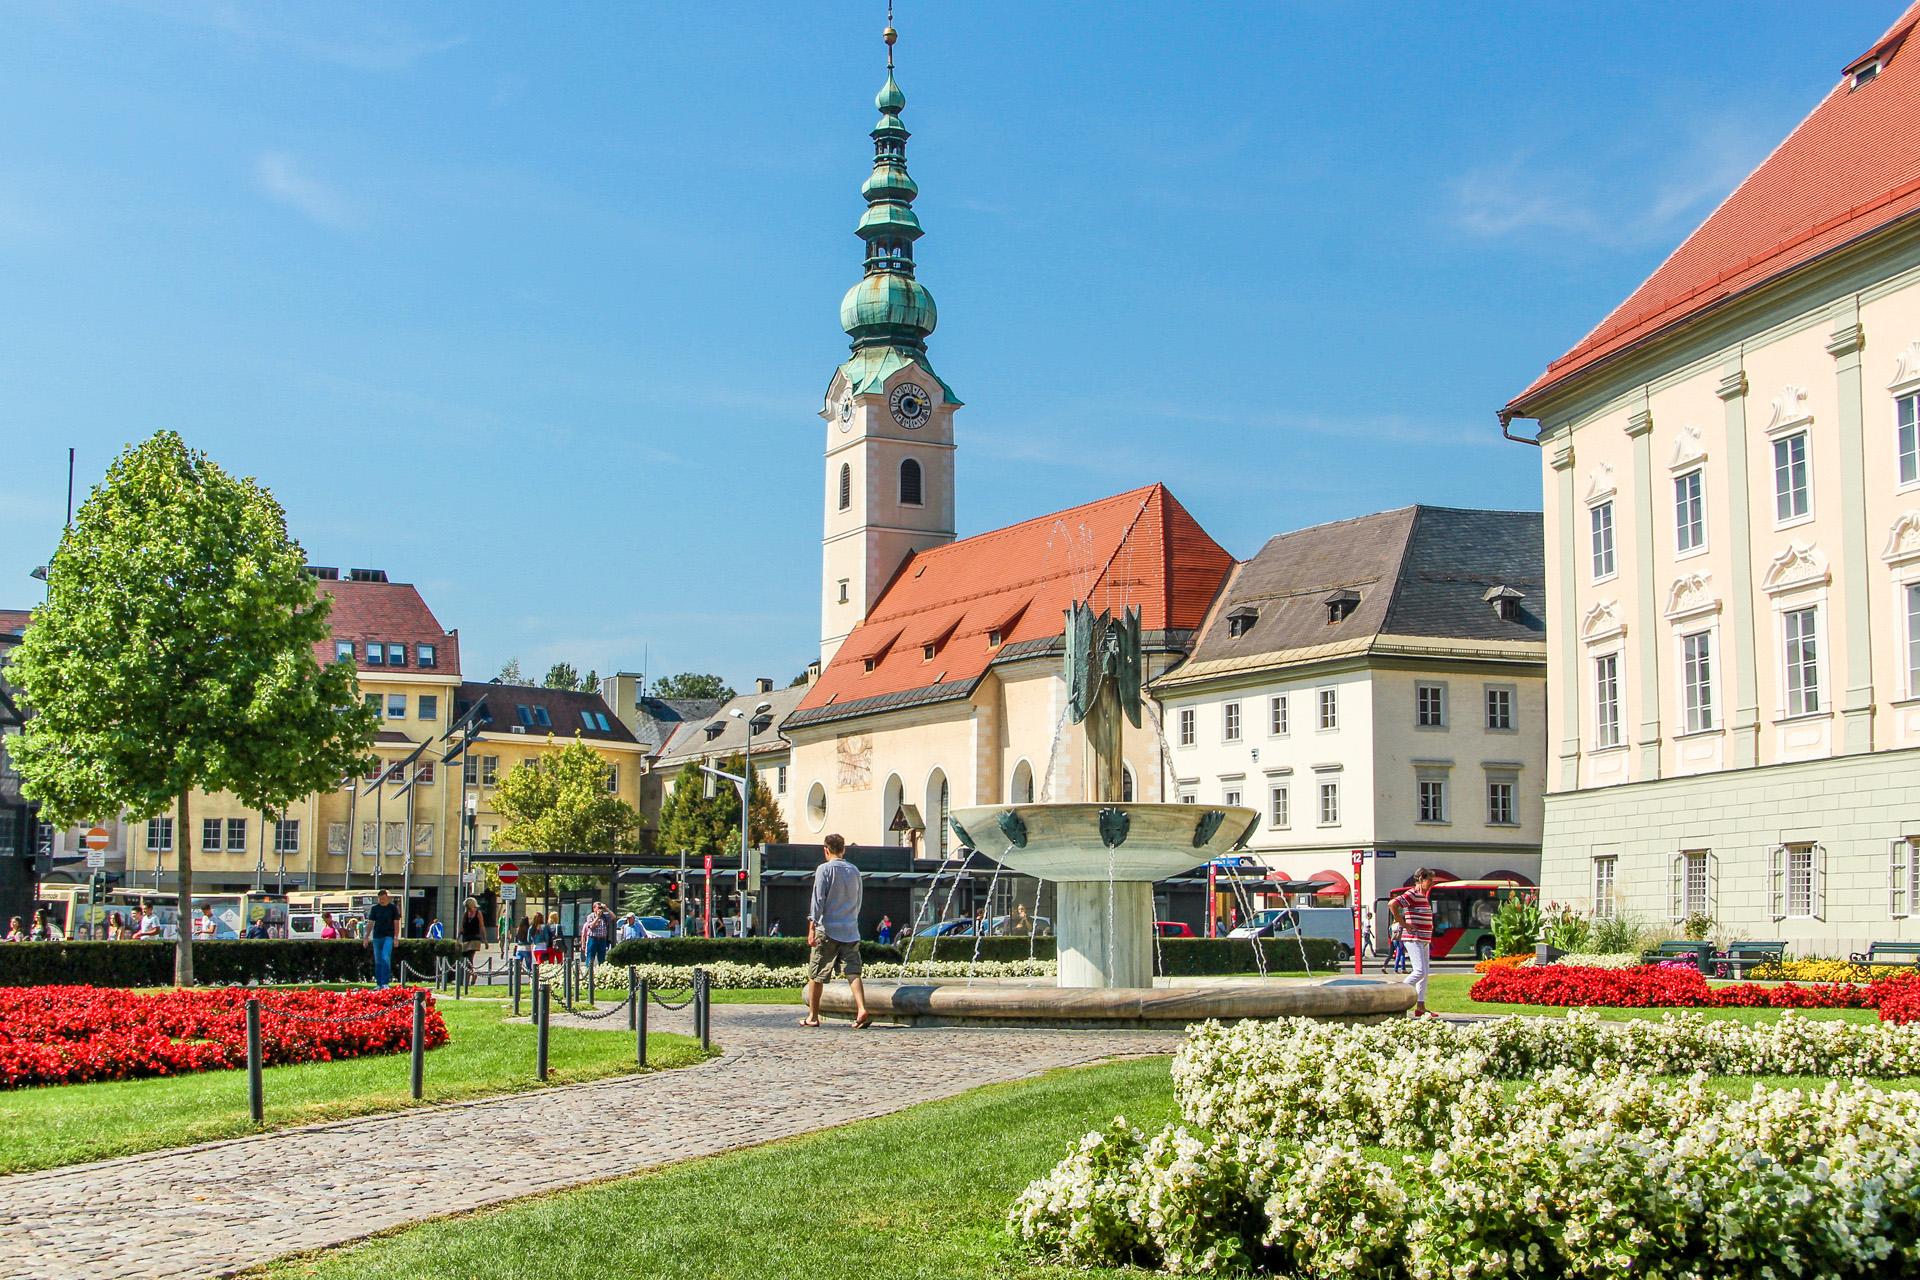 Klagenfurth